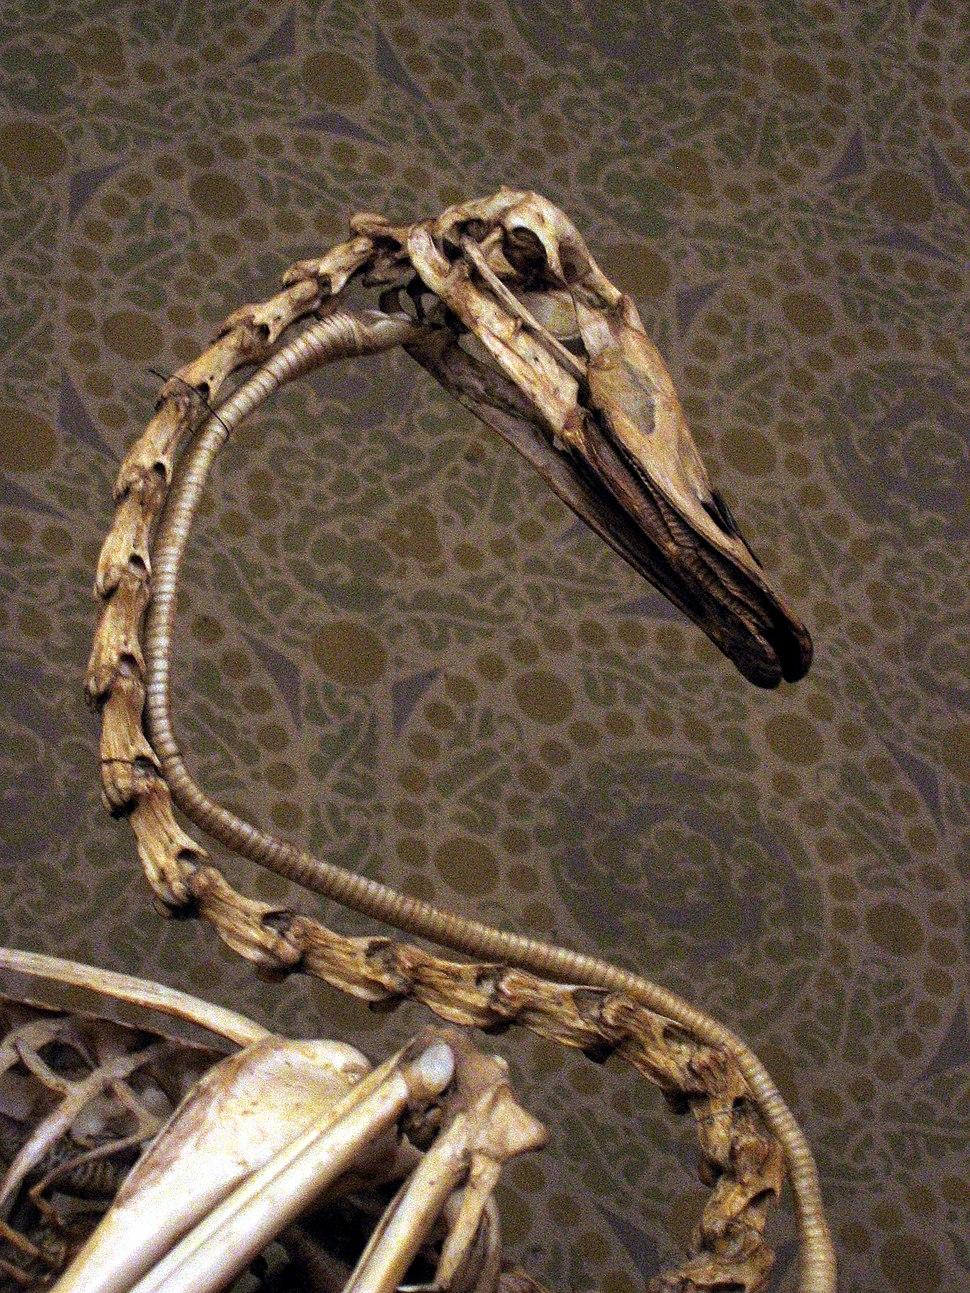 Swan neck skeleton